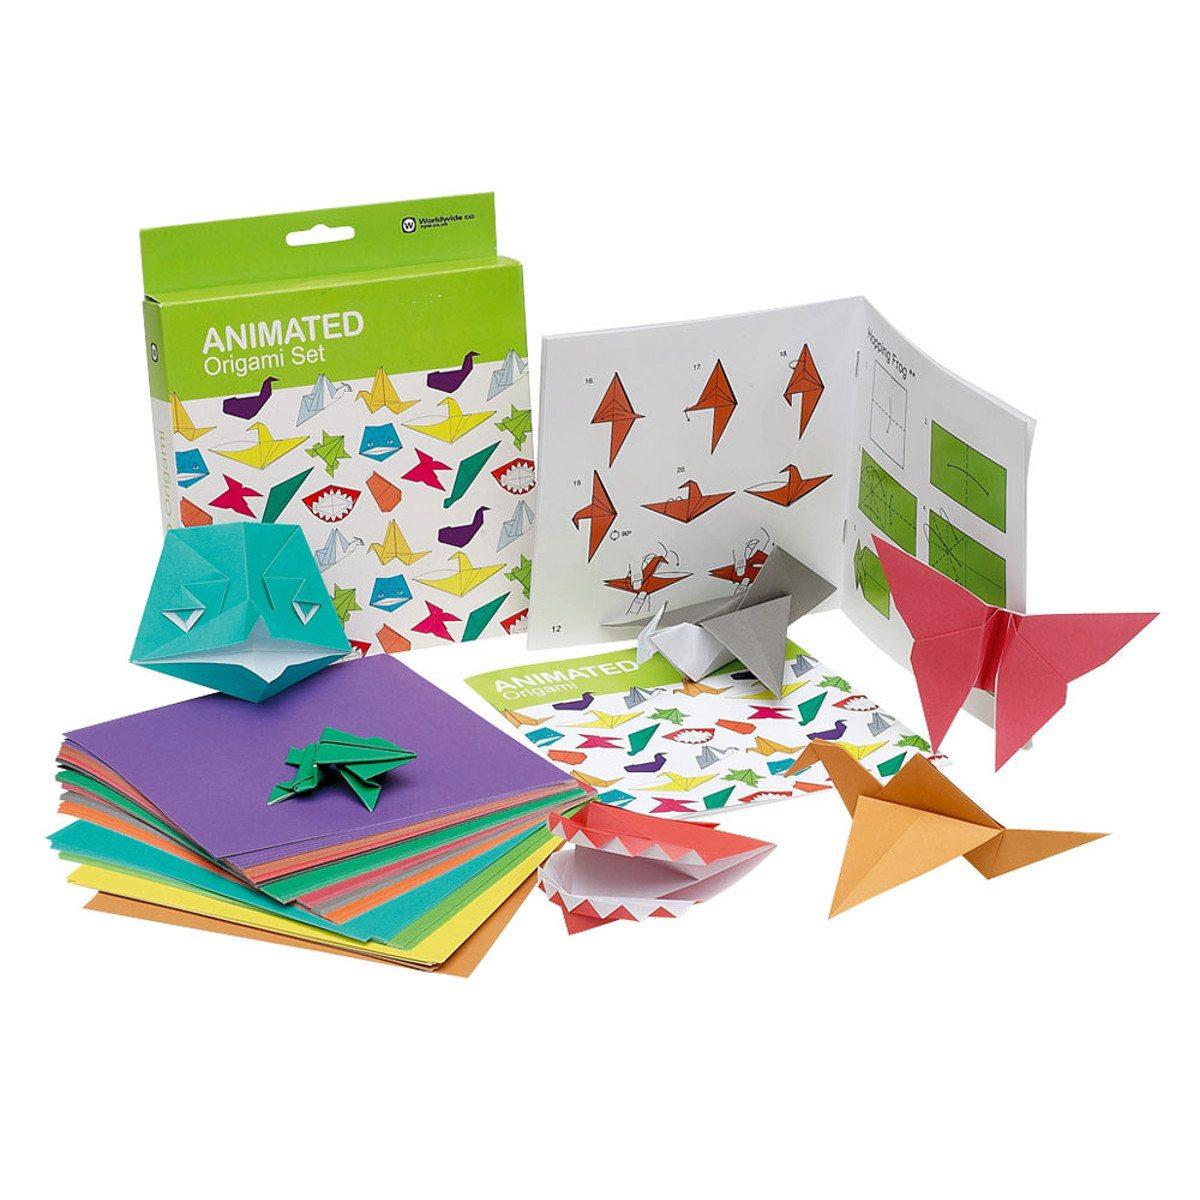 Origamisæt